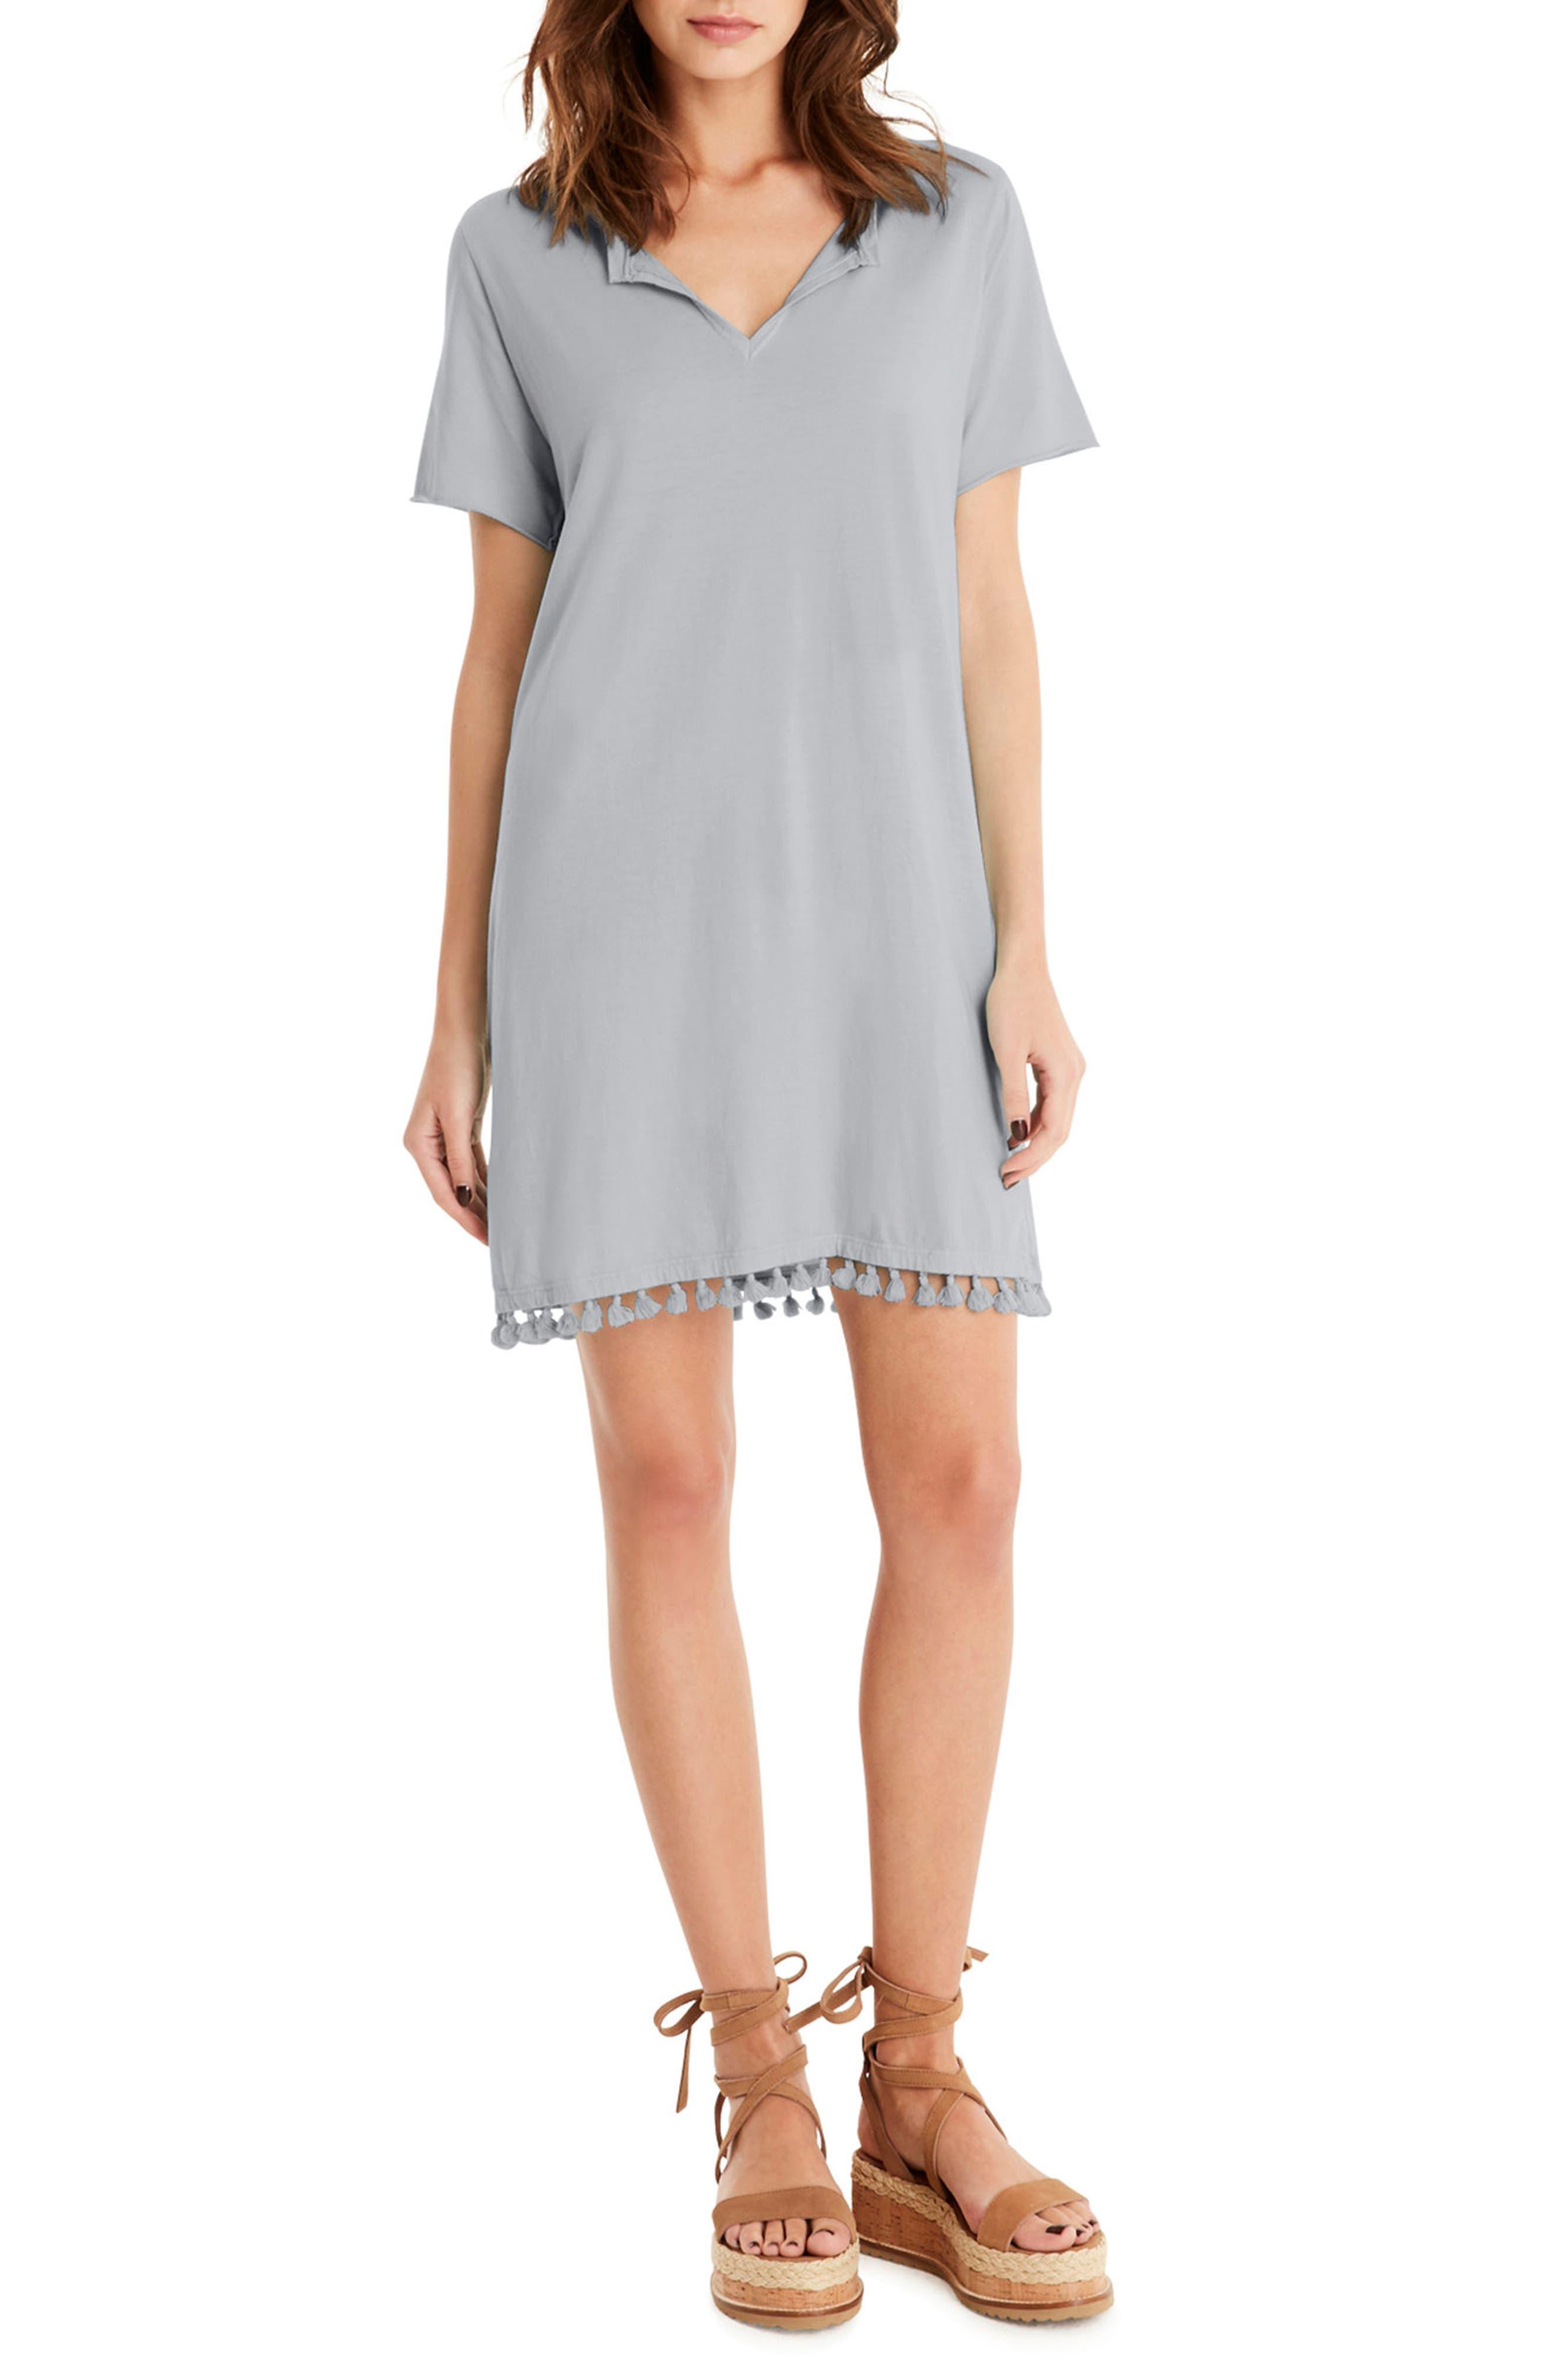 Alternate Image 1 Selected - Michael Stars T-Shirt Dress